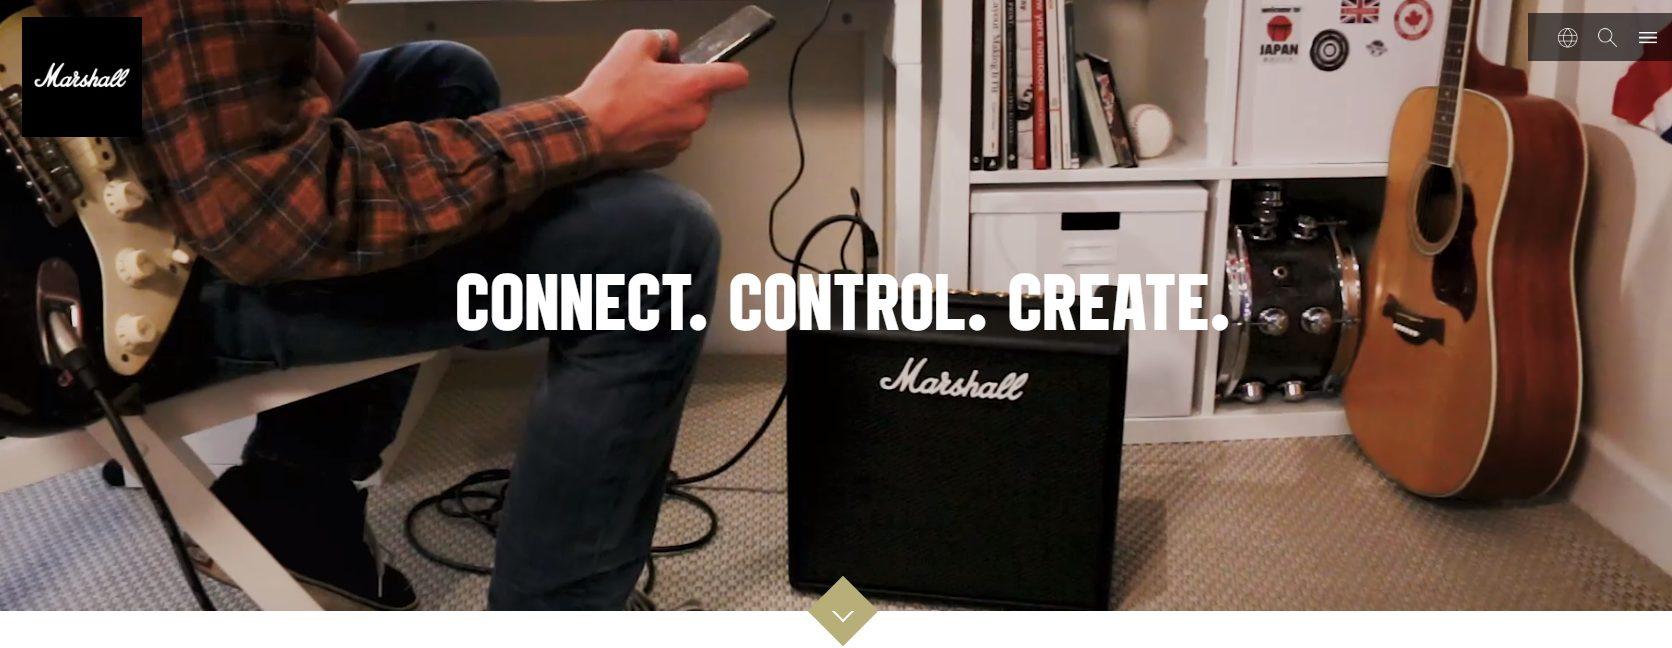 Marshall Code Home Page